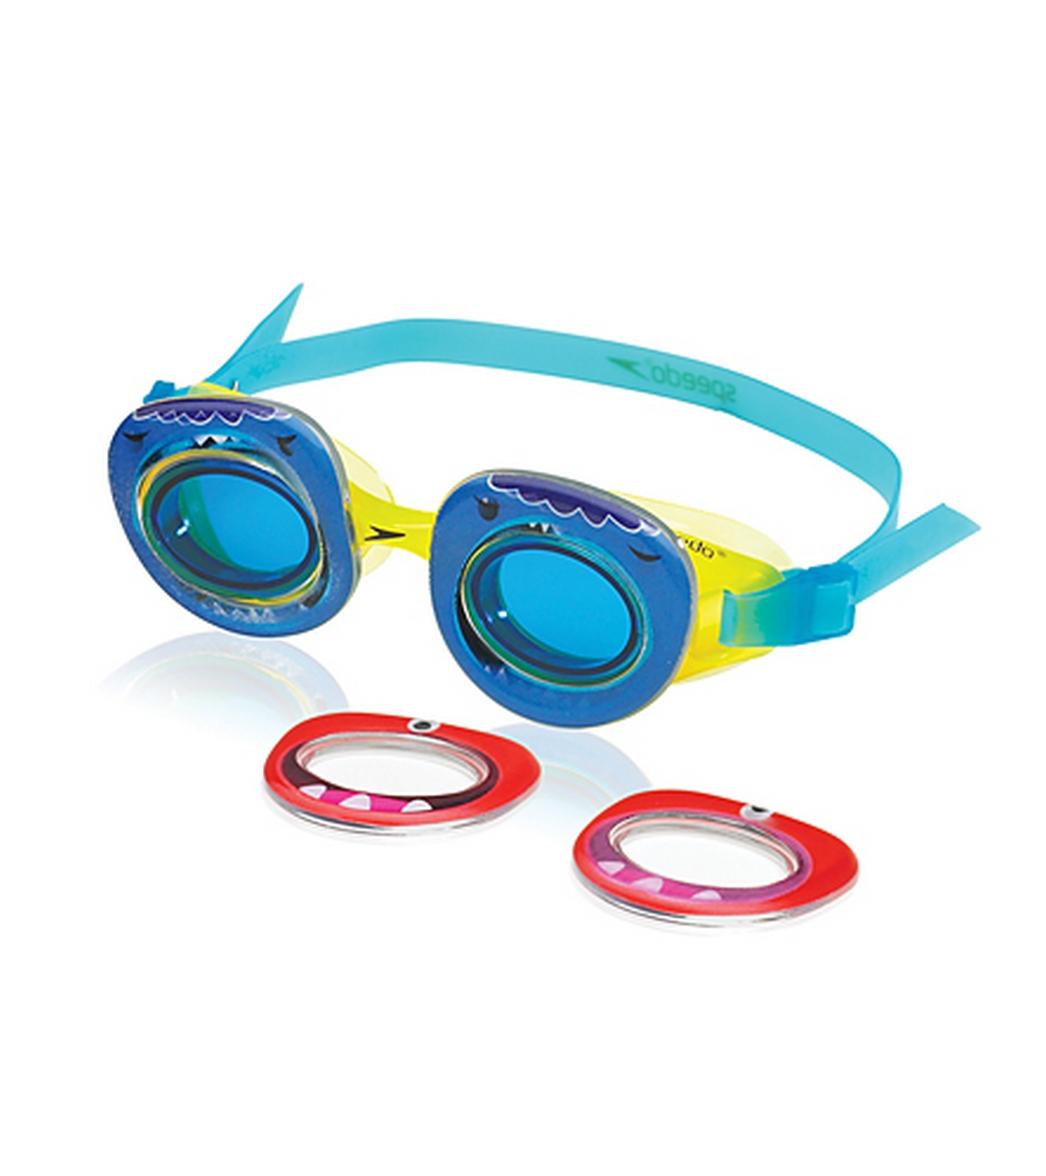 Speedo Neonwonders Lemon Yellow Goggle At Swimoutlet Com